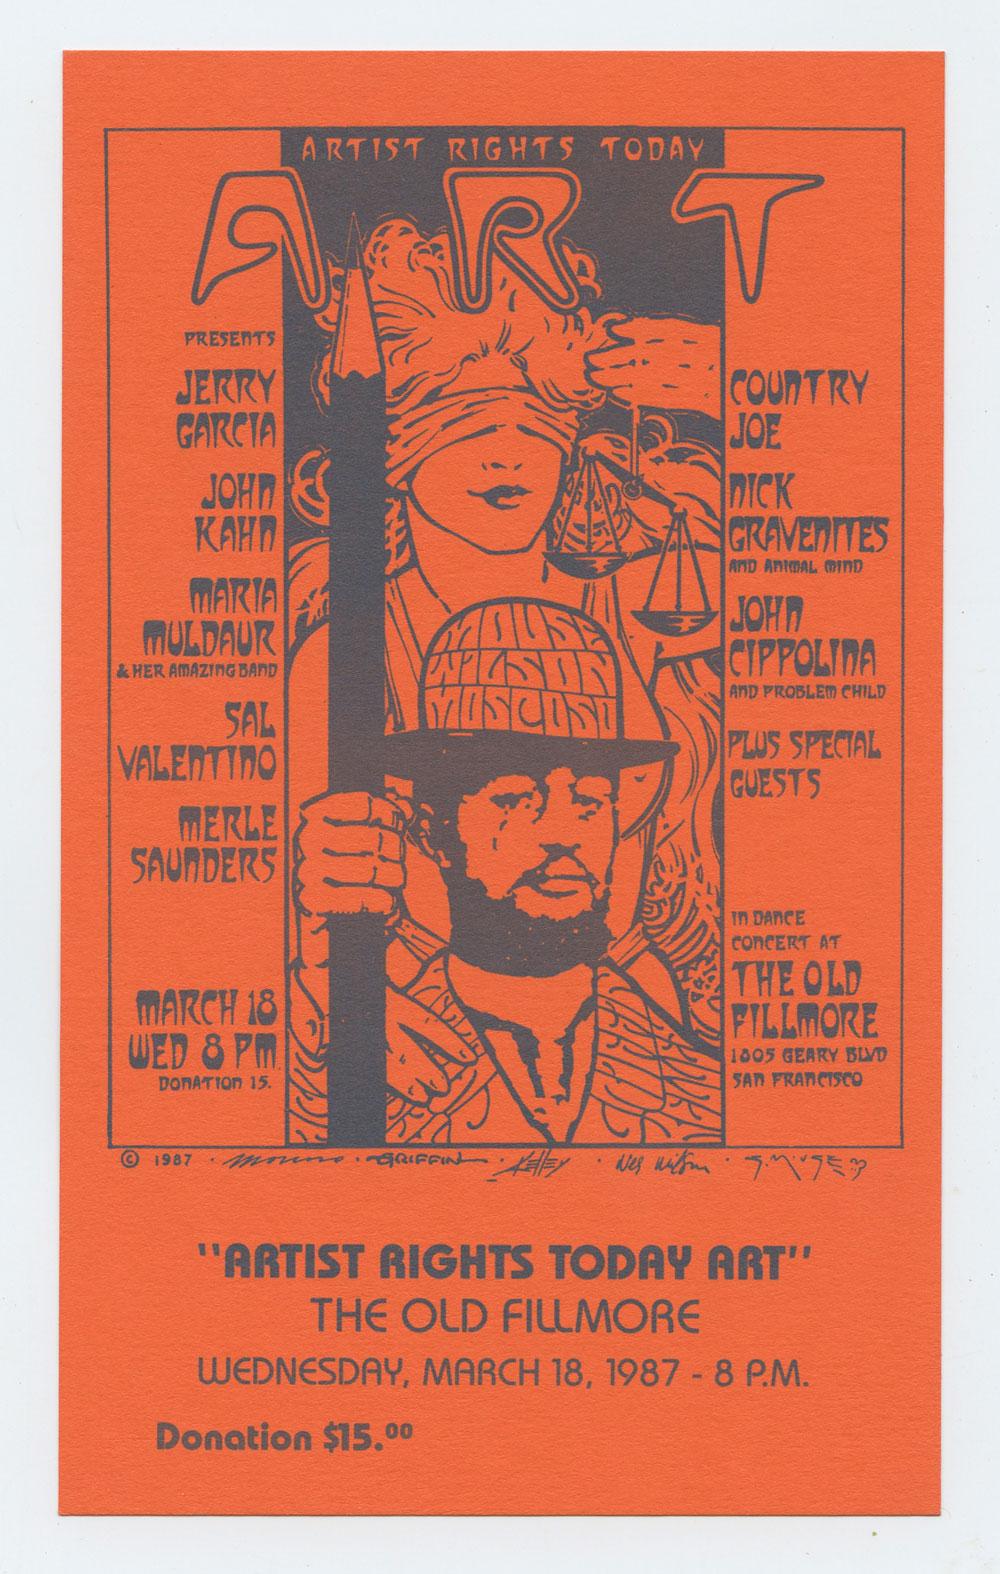 Artist Rights Today Art Concert Handbill 1987 March 16 Jerri Garcia